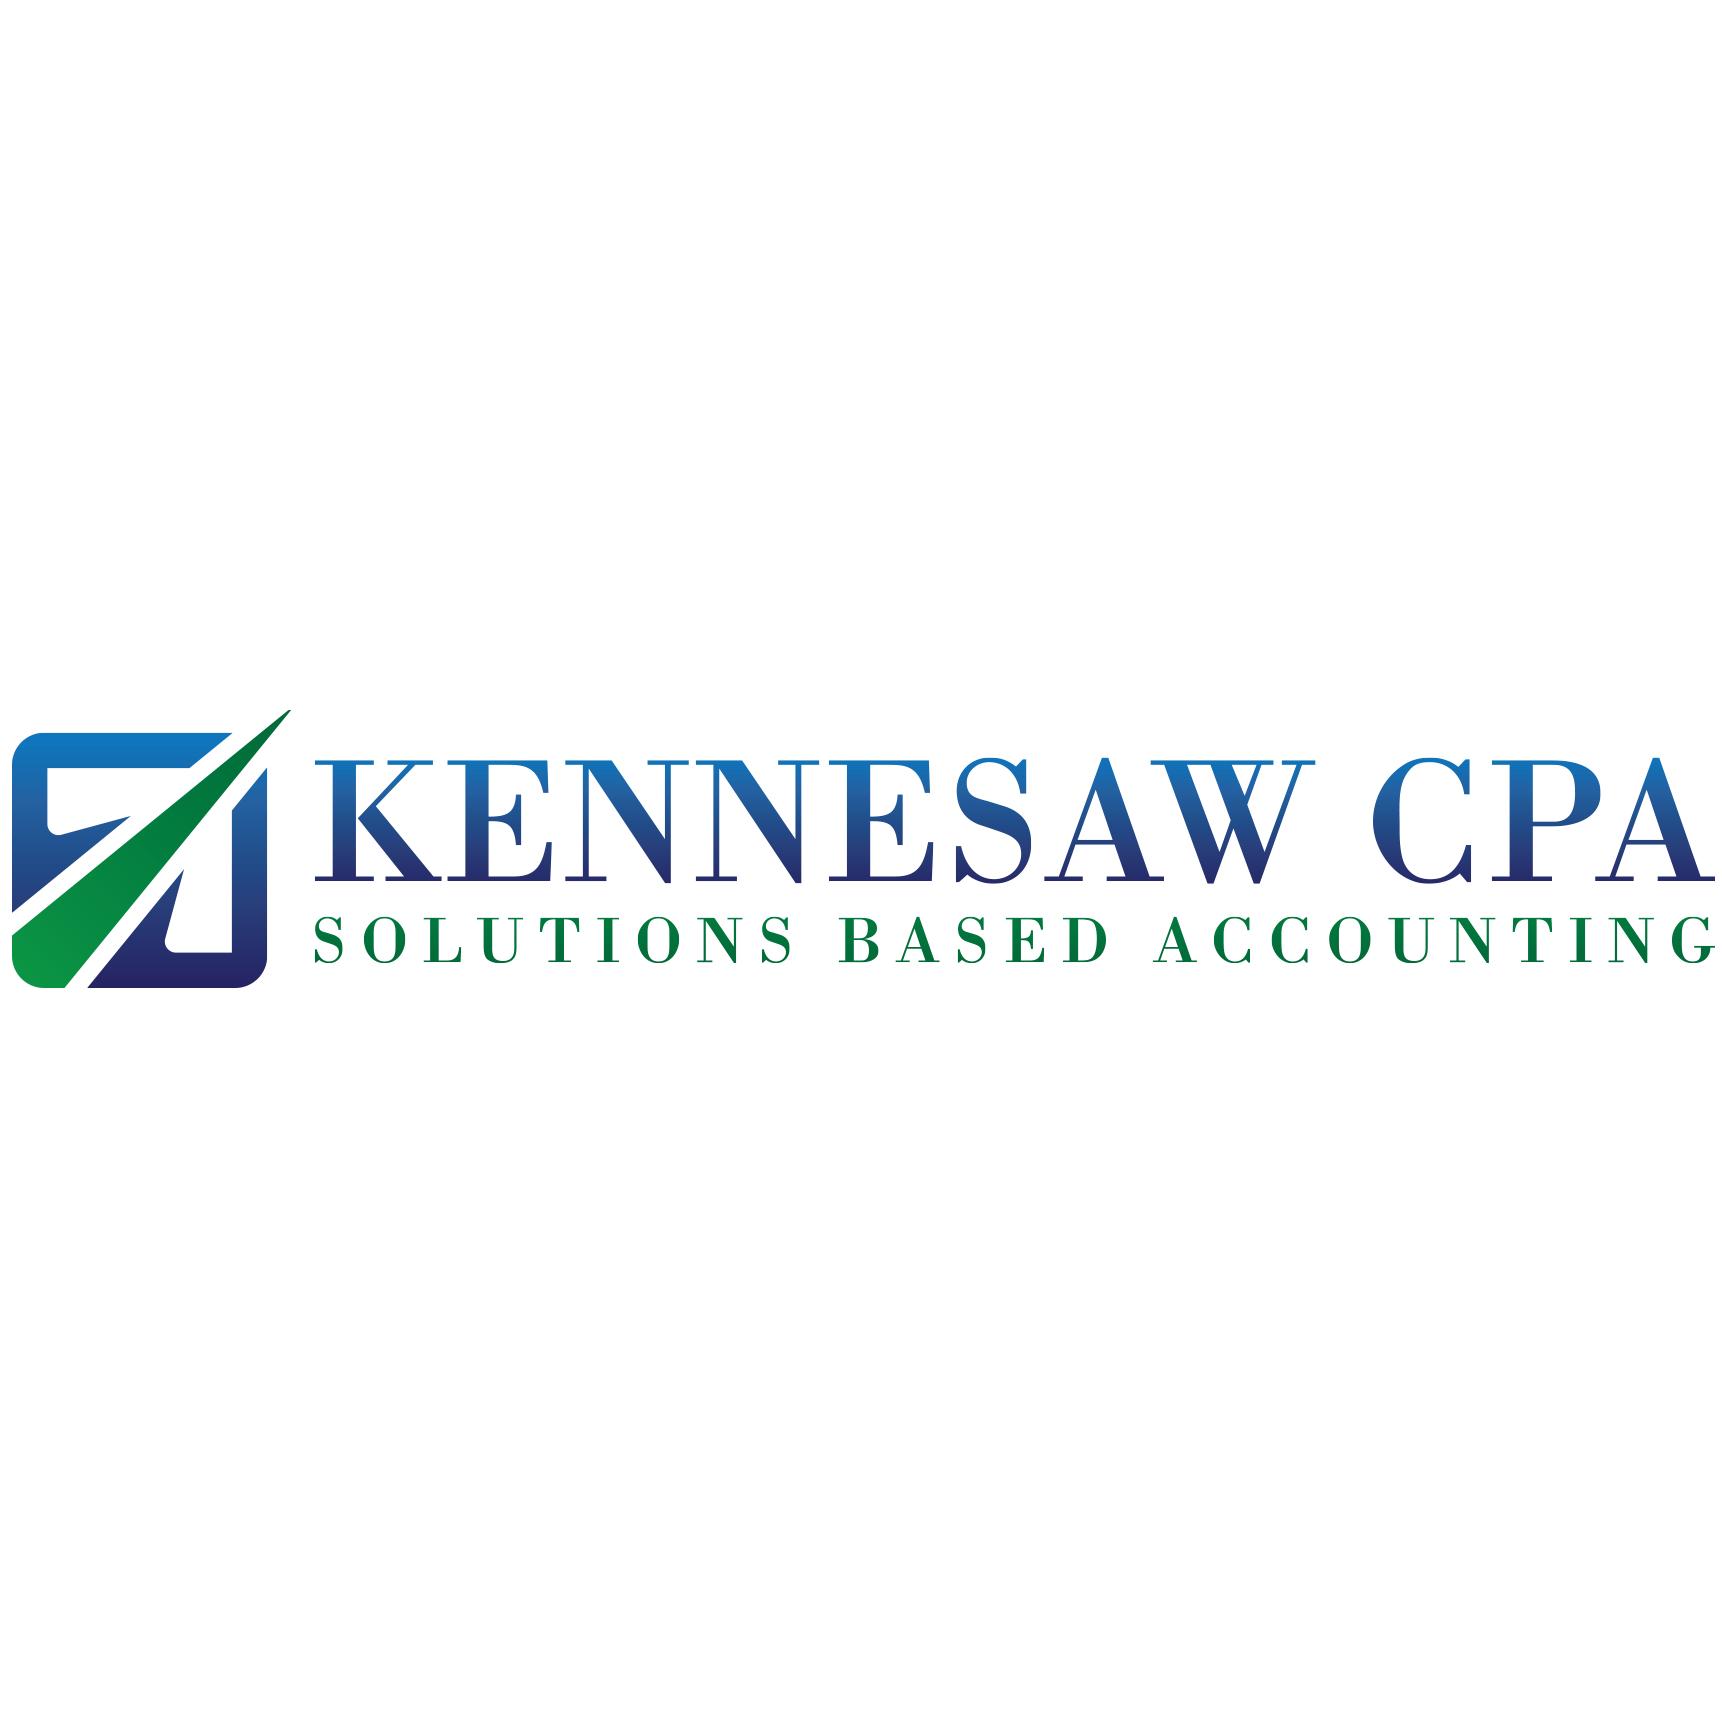 Kennesaw CPA